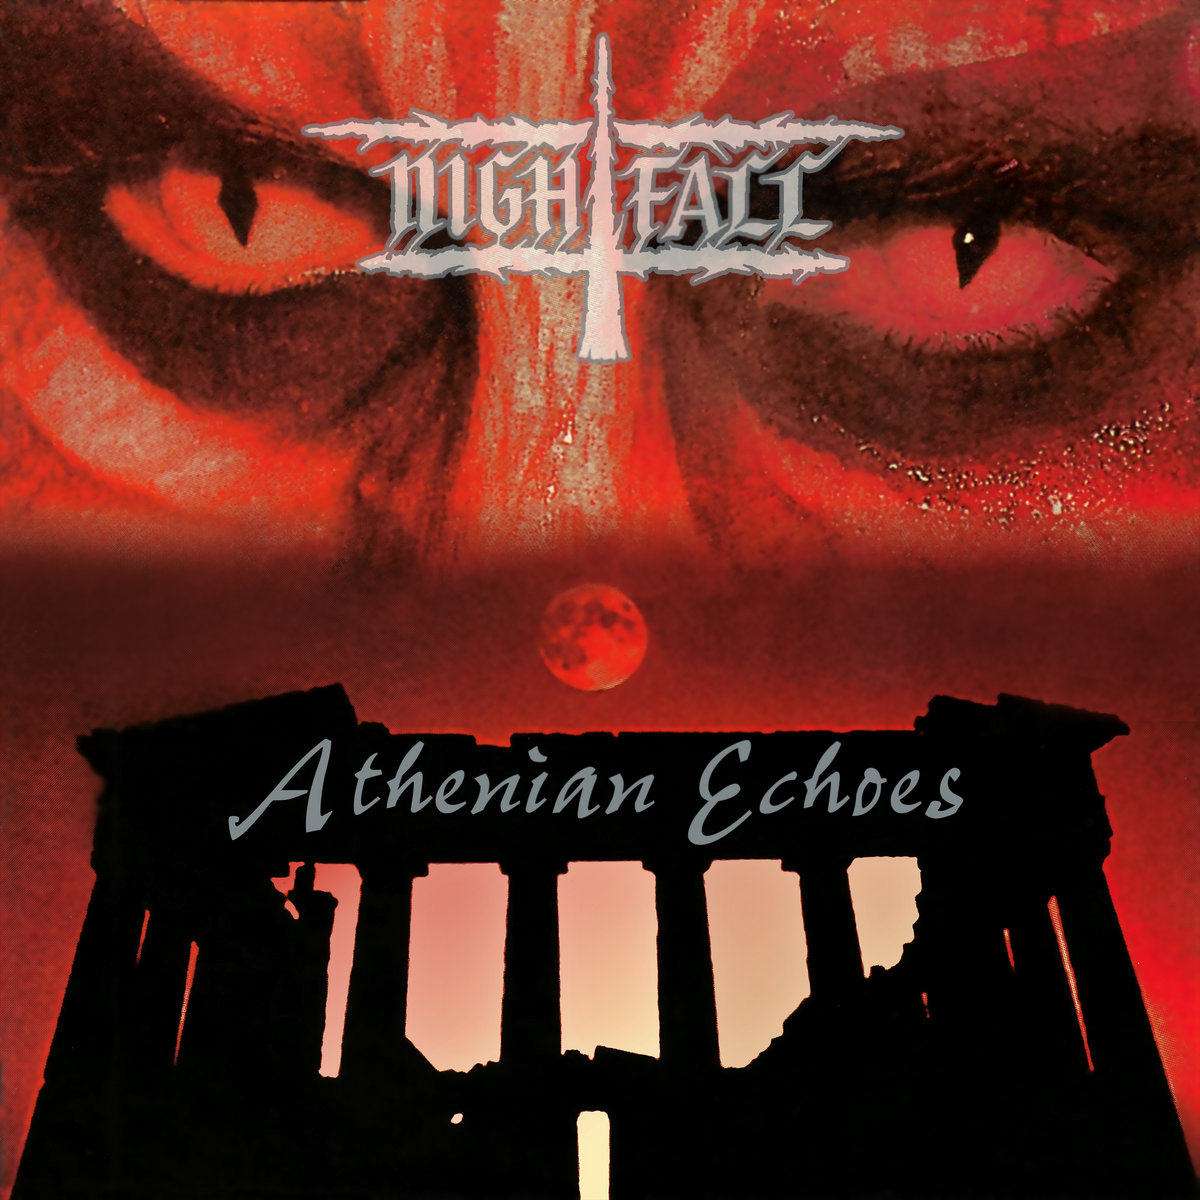 Athenian Echoes | Nightfall